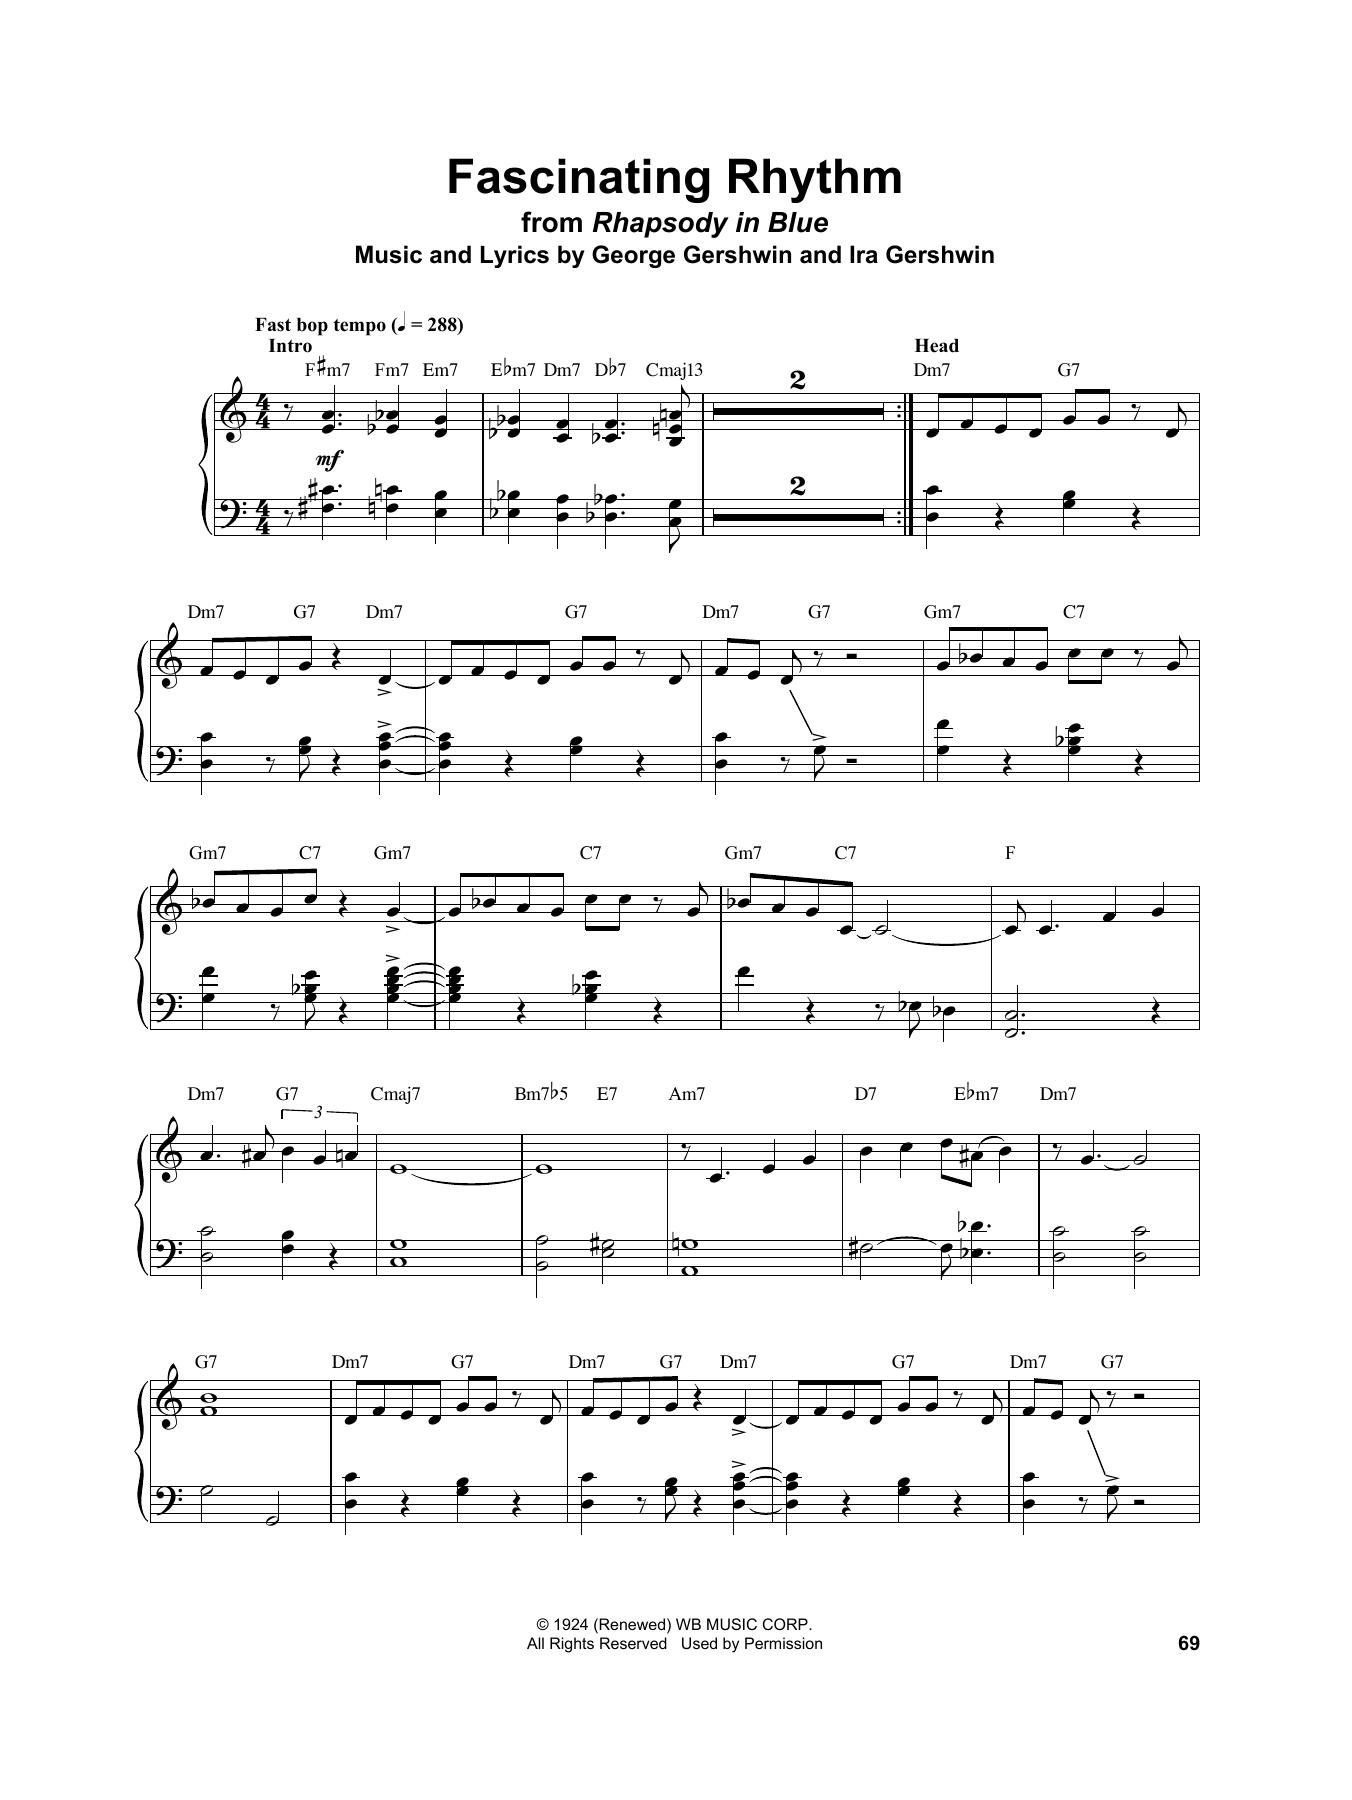 Vince Guaraldi Fascinating Rhythm sheet music notes and chords